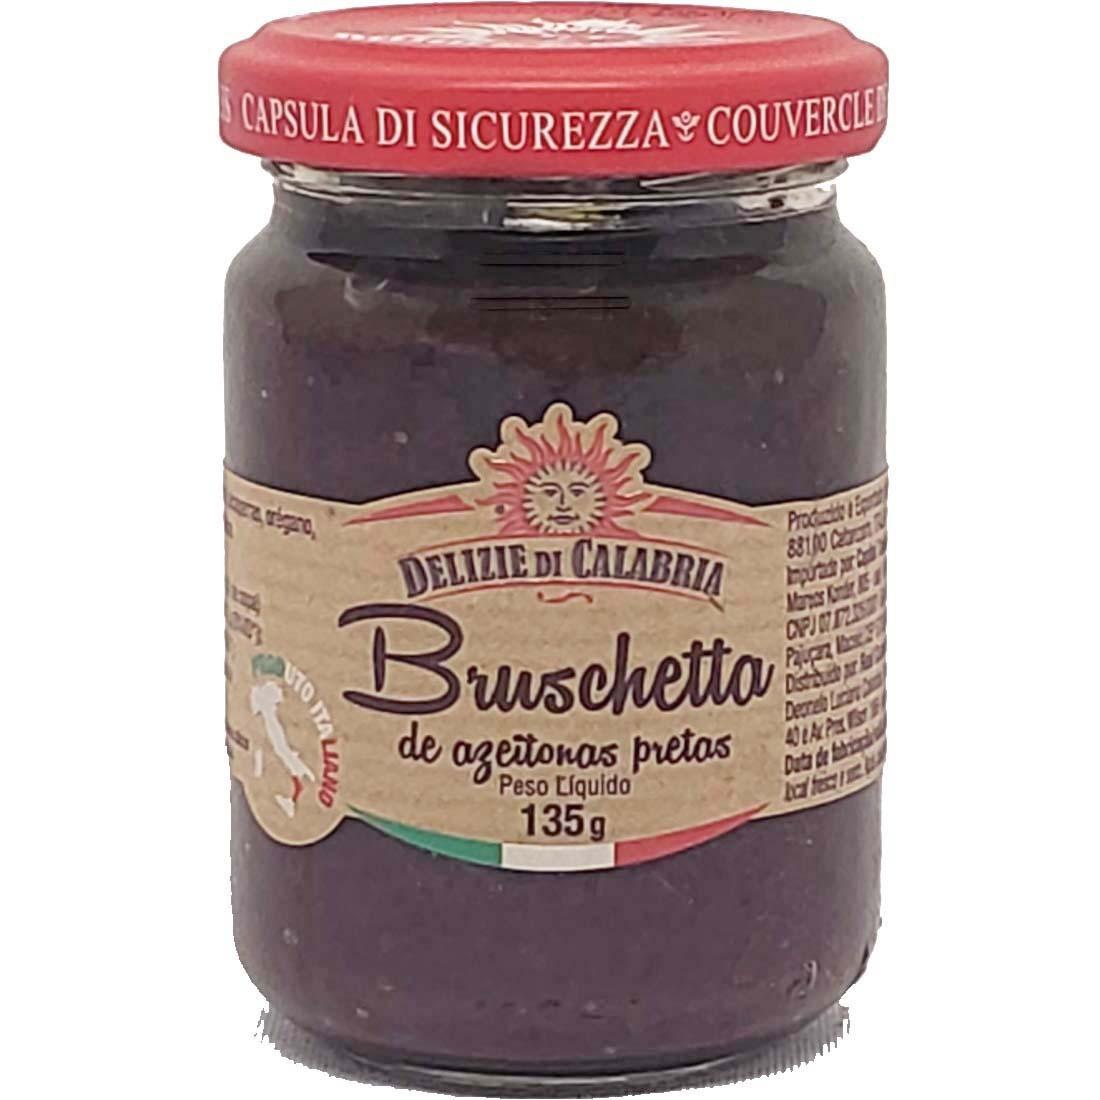 Bruschetta Delizie Di Calabria - 135g -